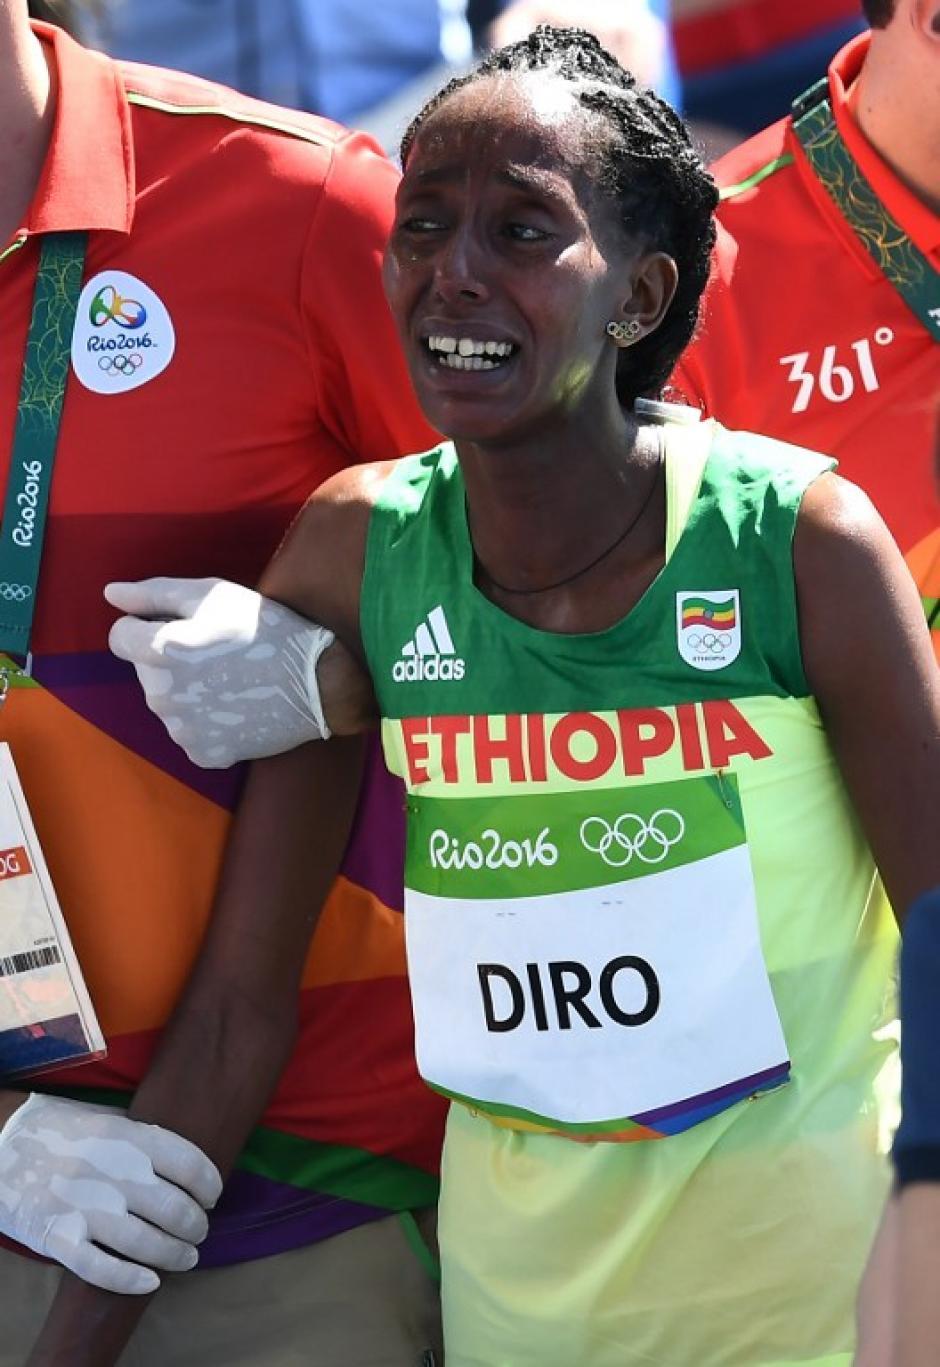 Cuando terminó, lloró desconsolada por quedar fuera de la final. (Foto: AFP)